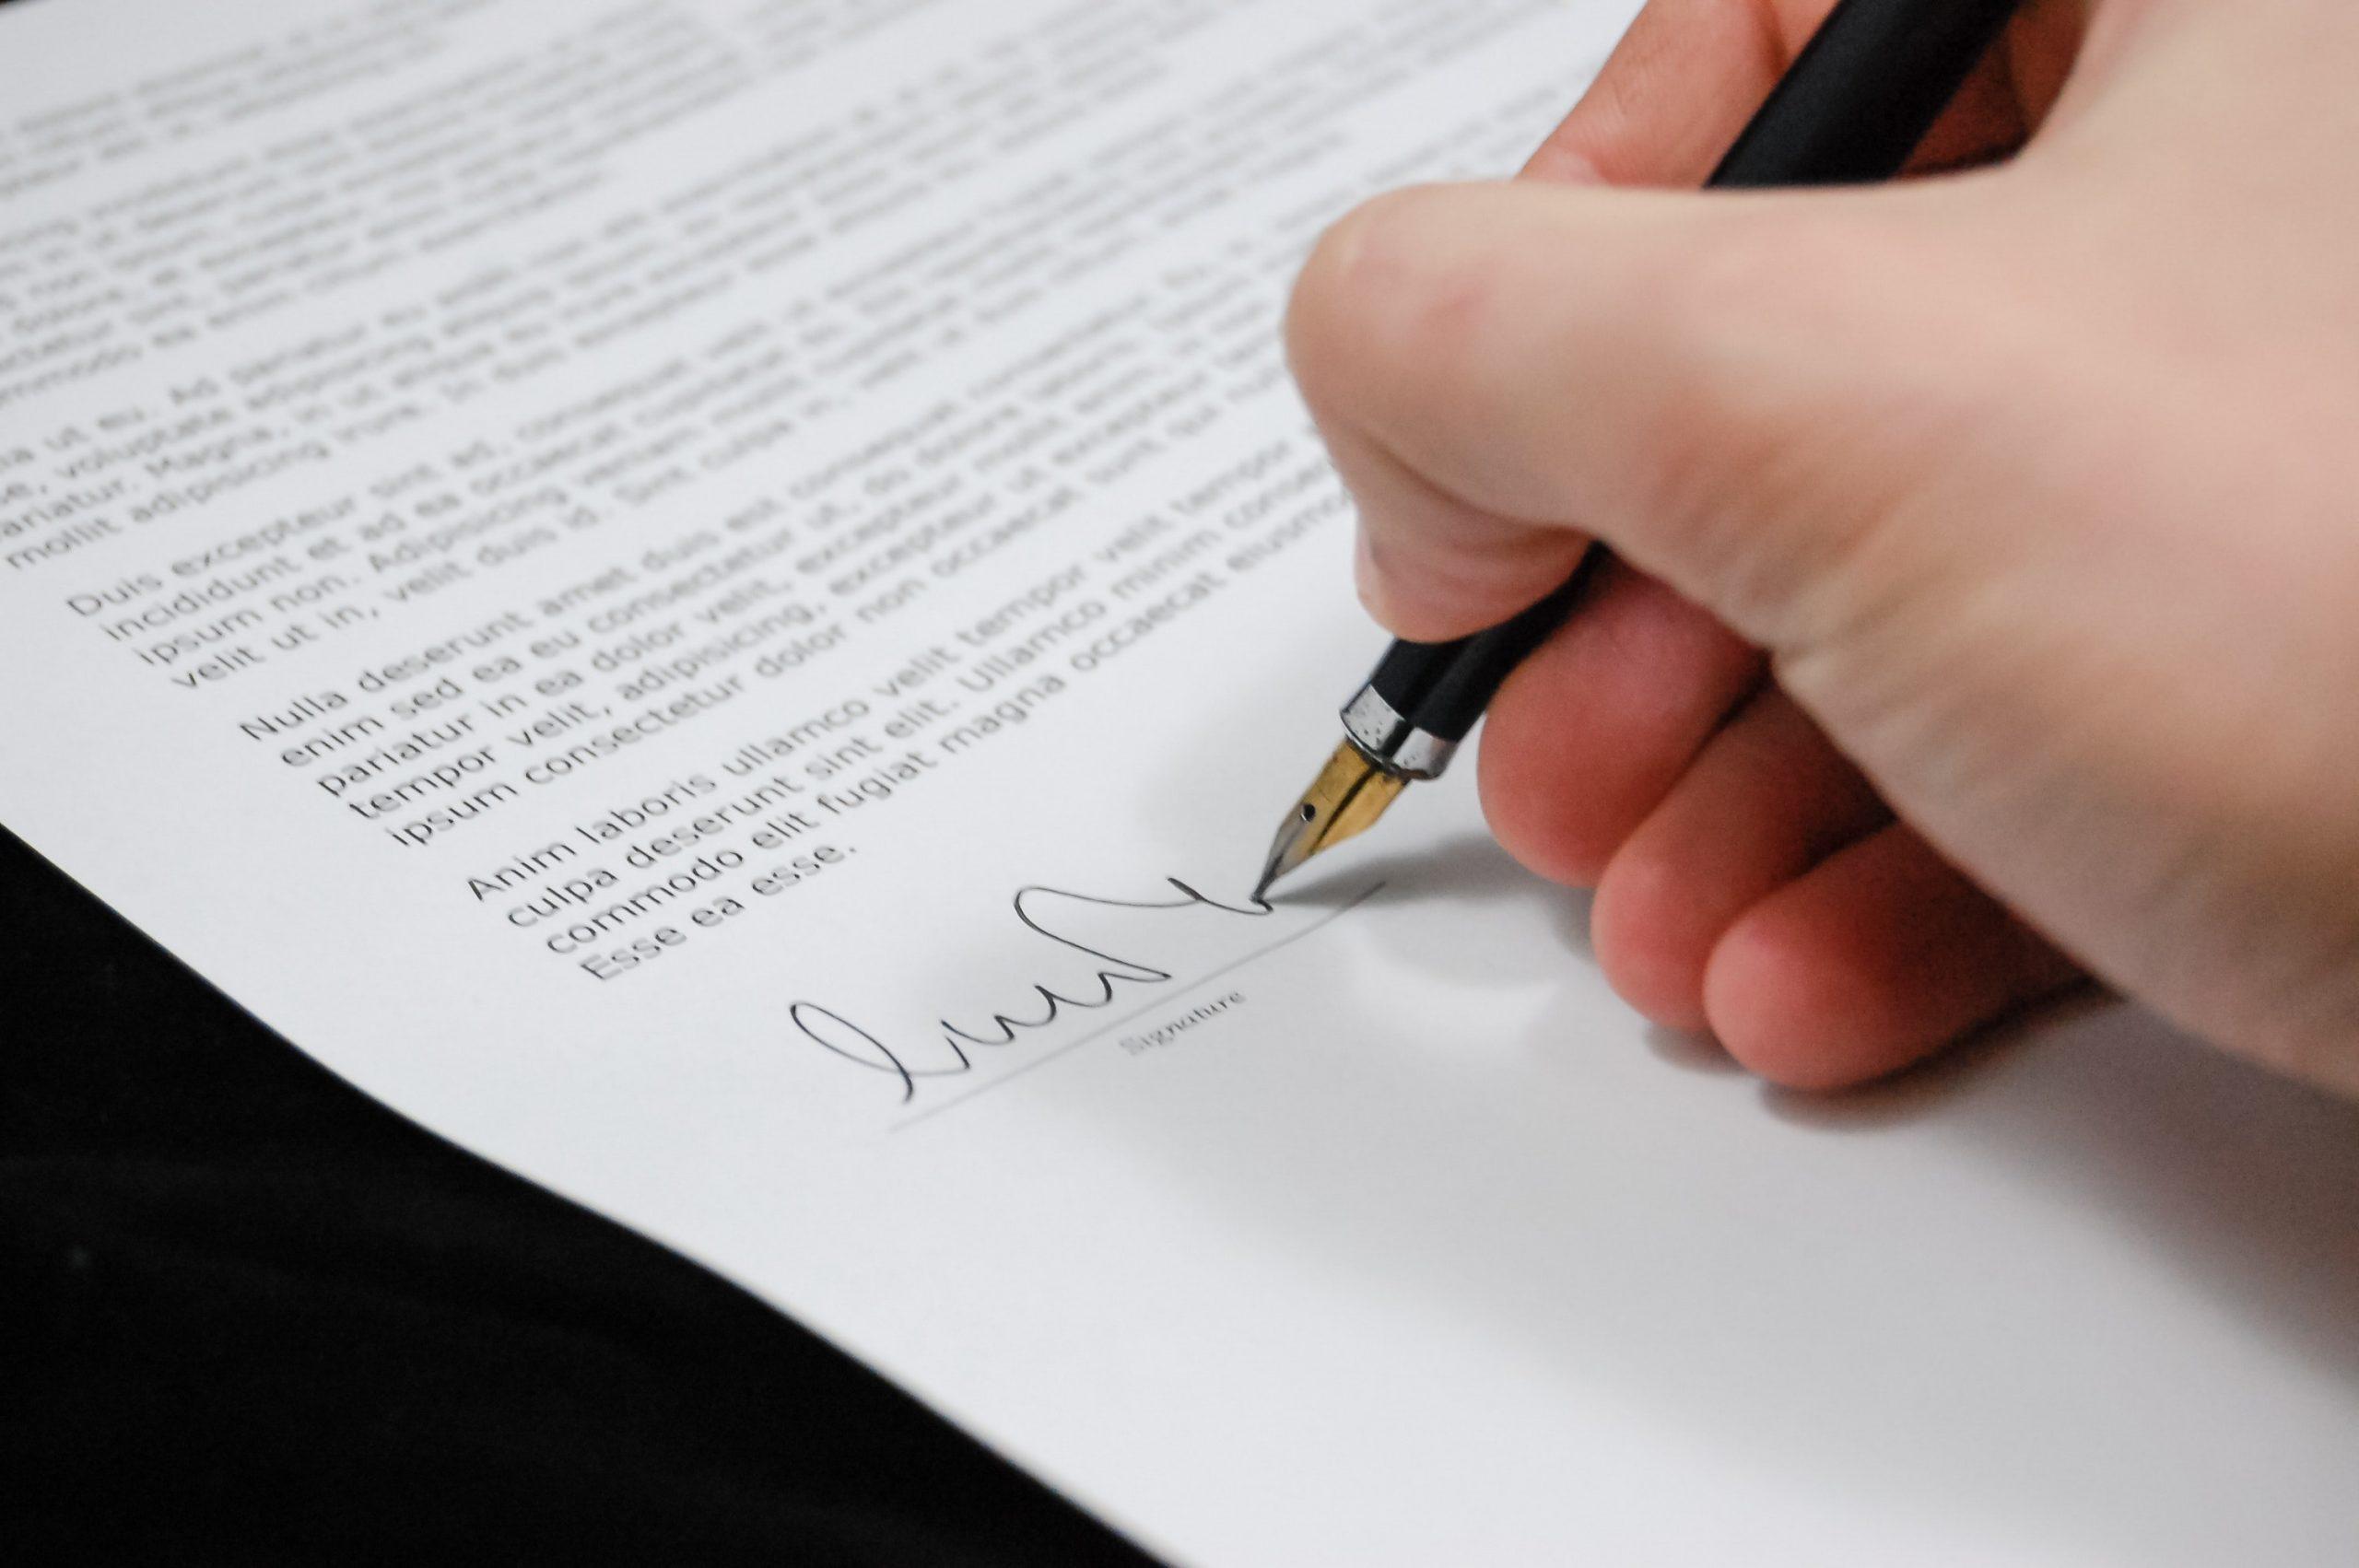 Someone signing paper